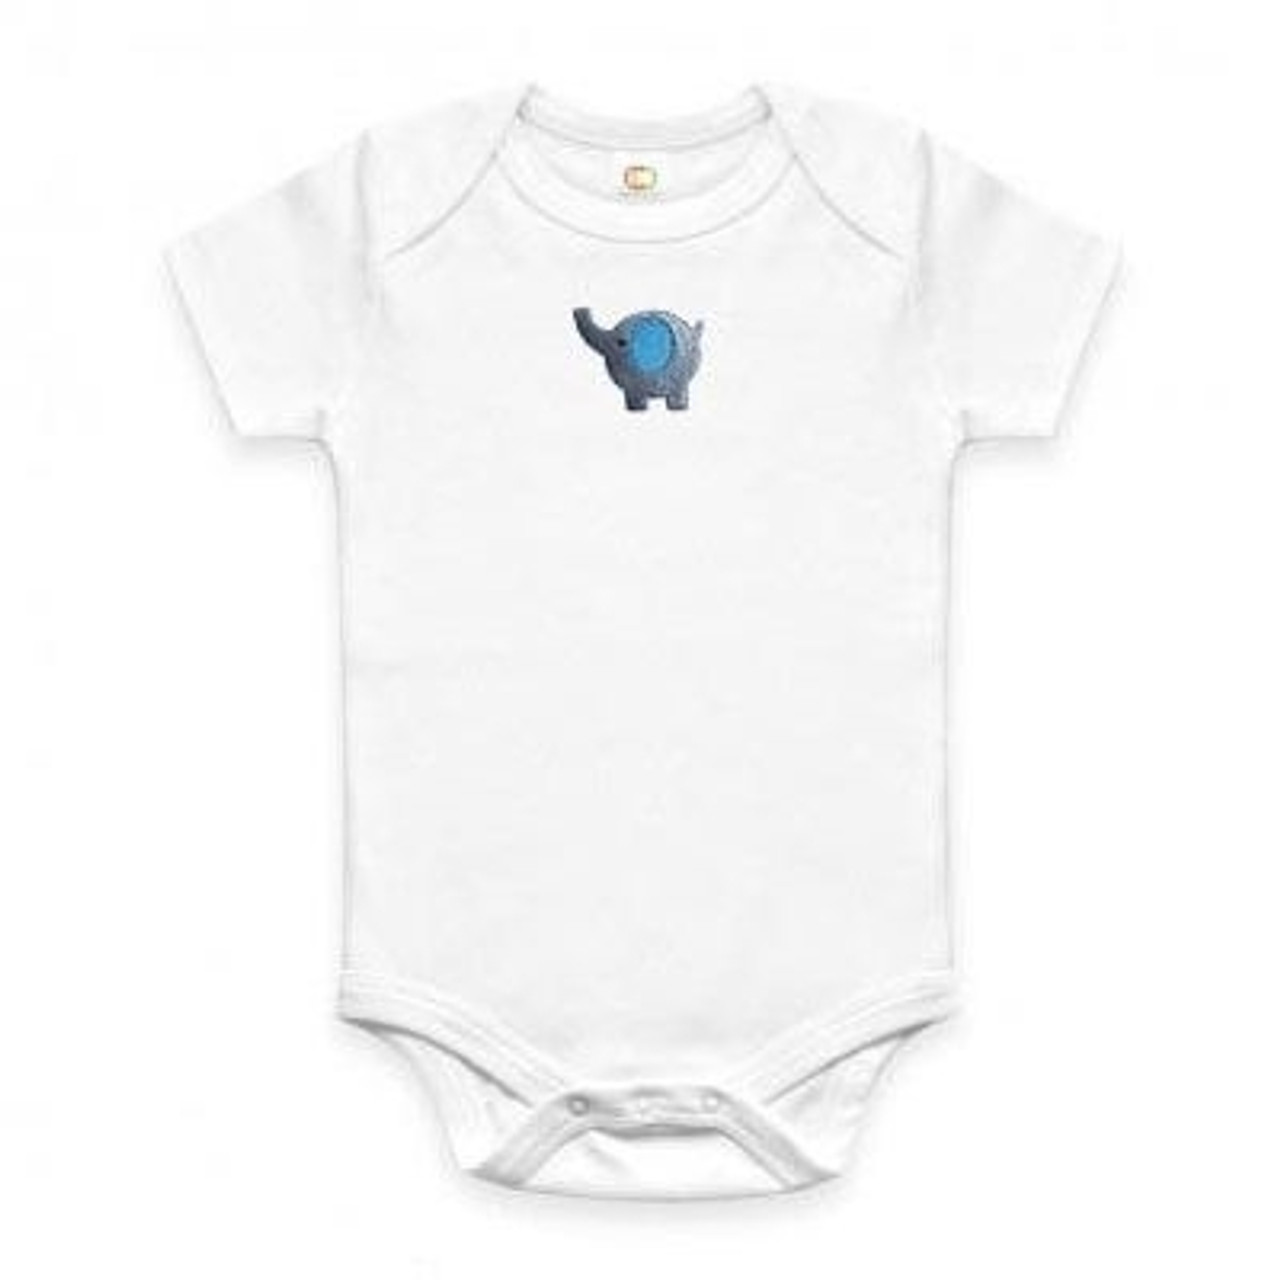 Organic Baby Onesie - Embroidered Elephant